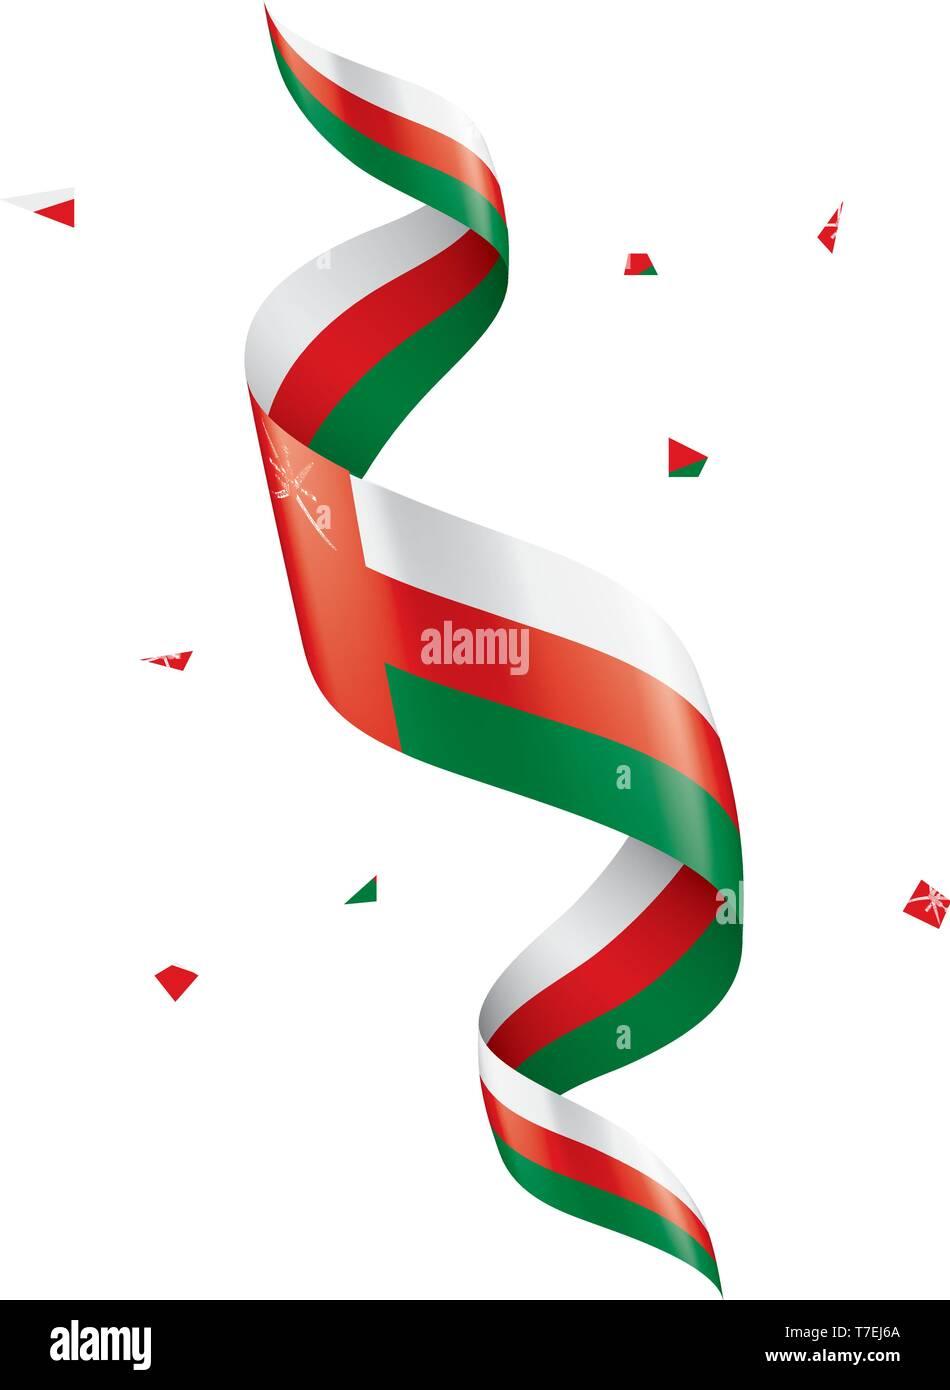 Oman flag, vector illustration on a white background - Stock Image